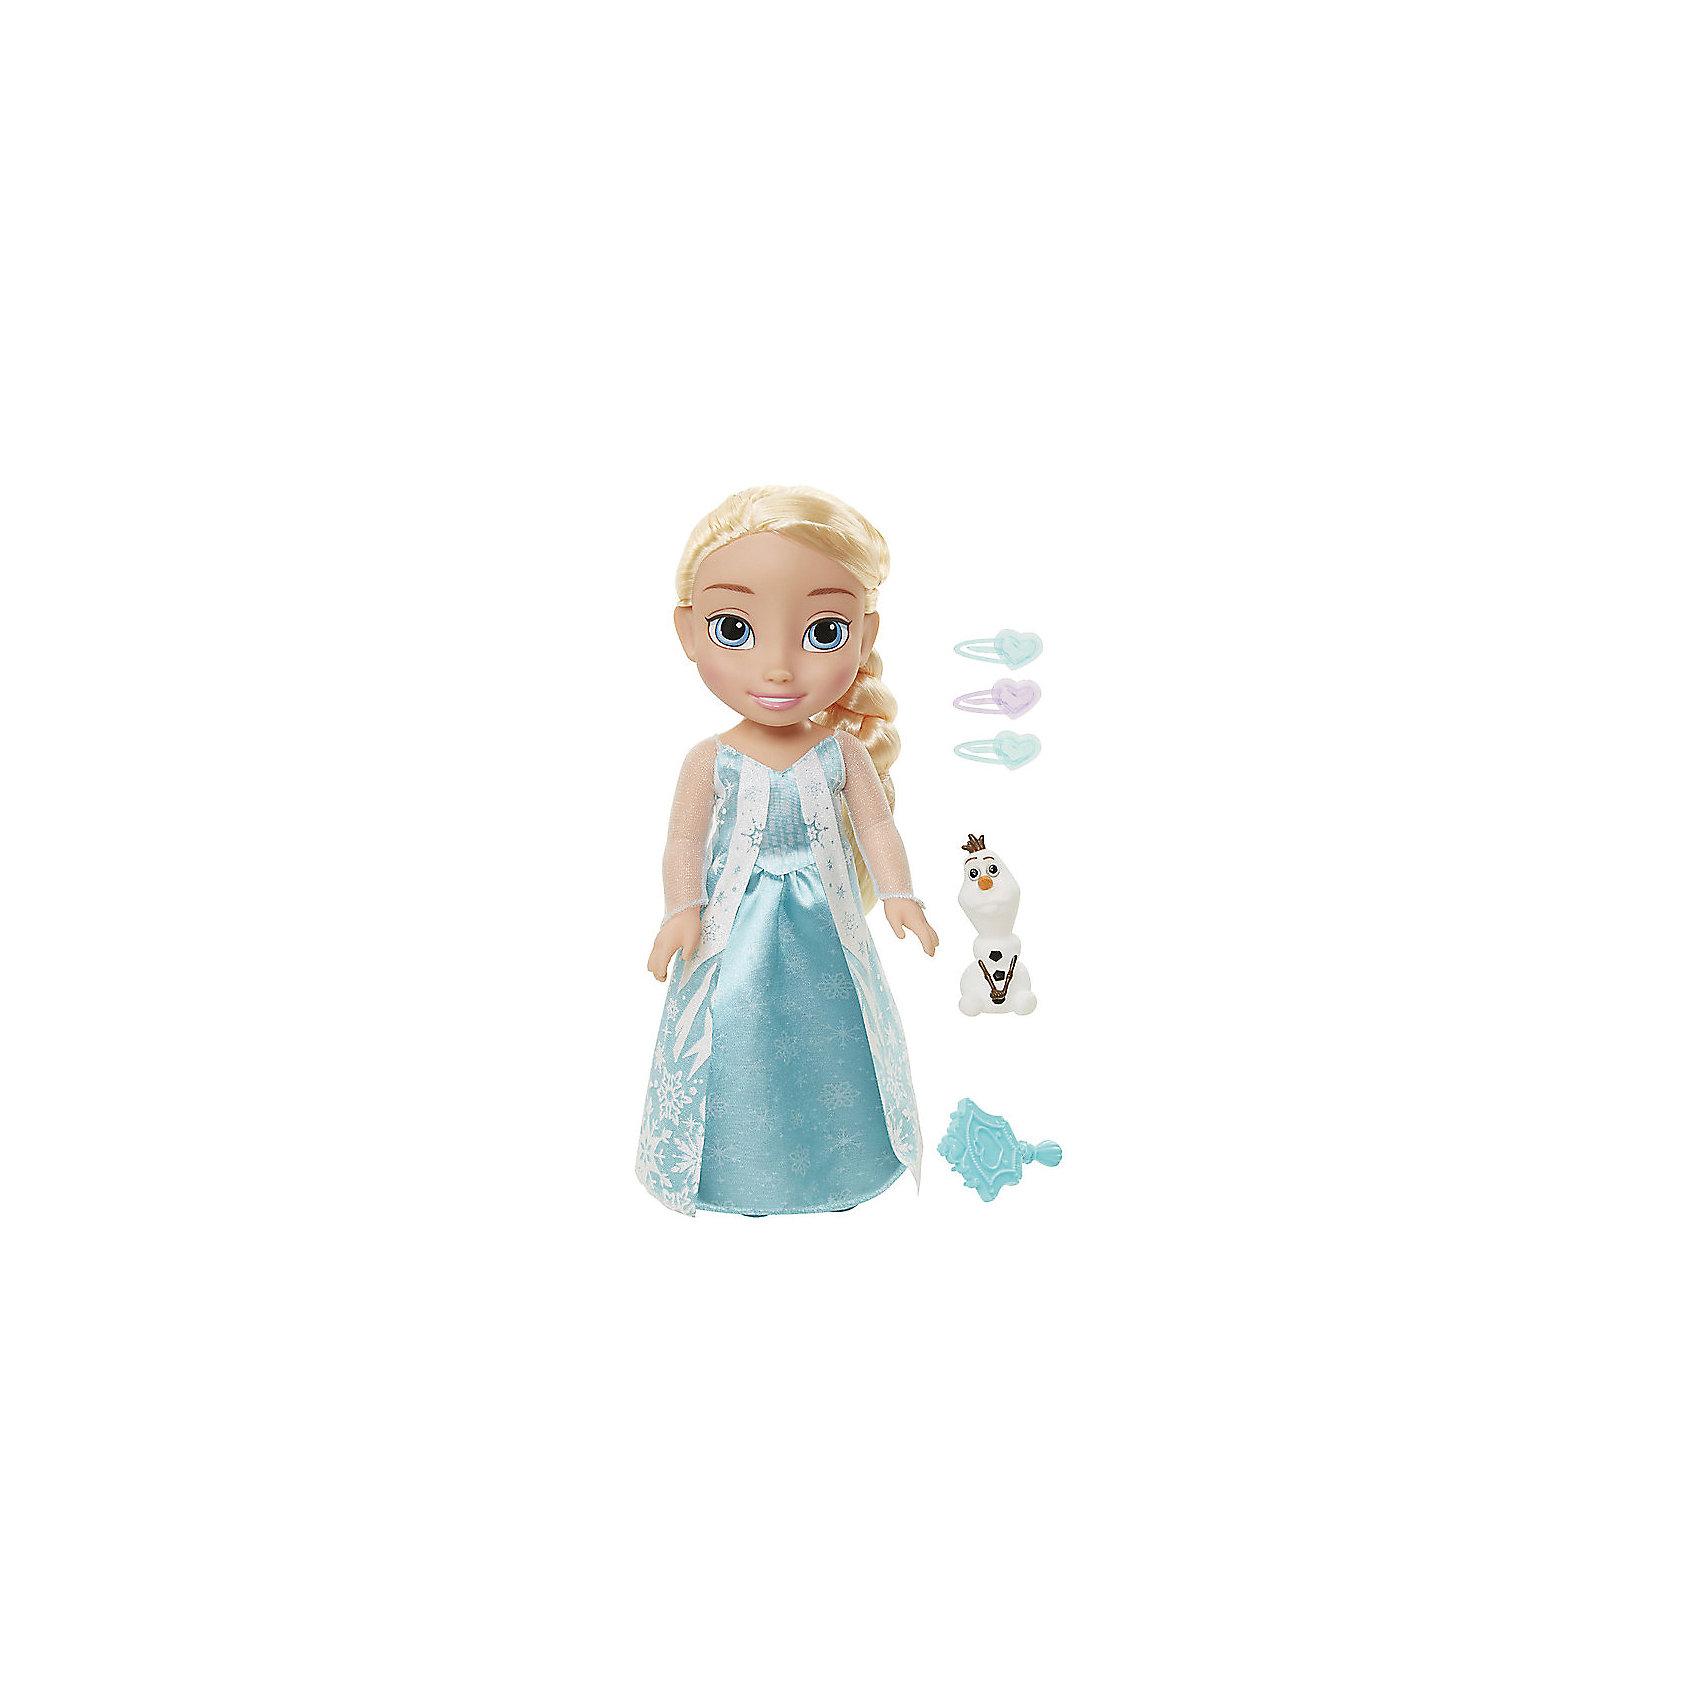 "Jakks Pacific Кукла-малышка ""Холодное сердце"" с аксессуарами, Эльза, 35 см."